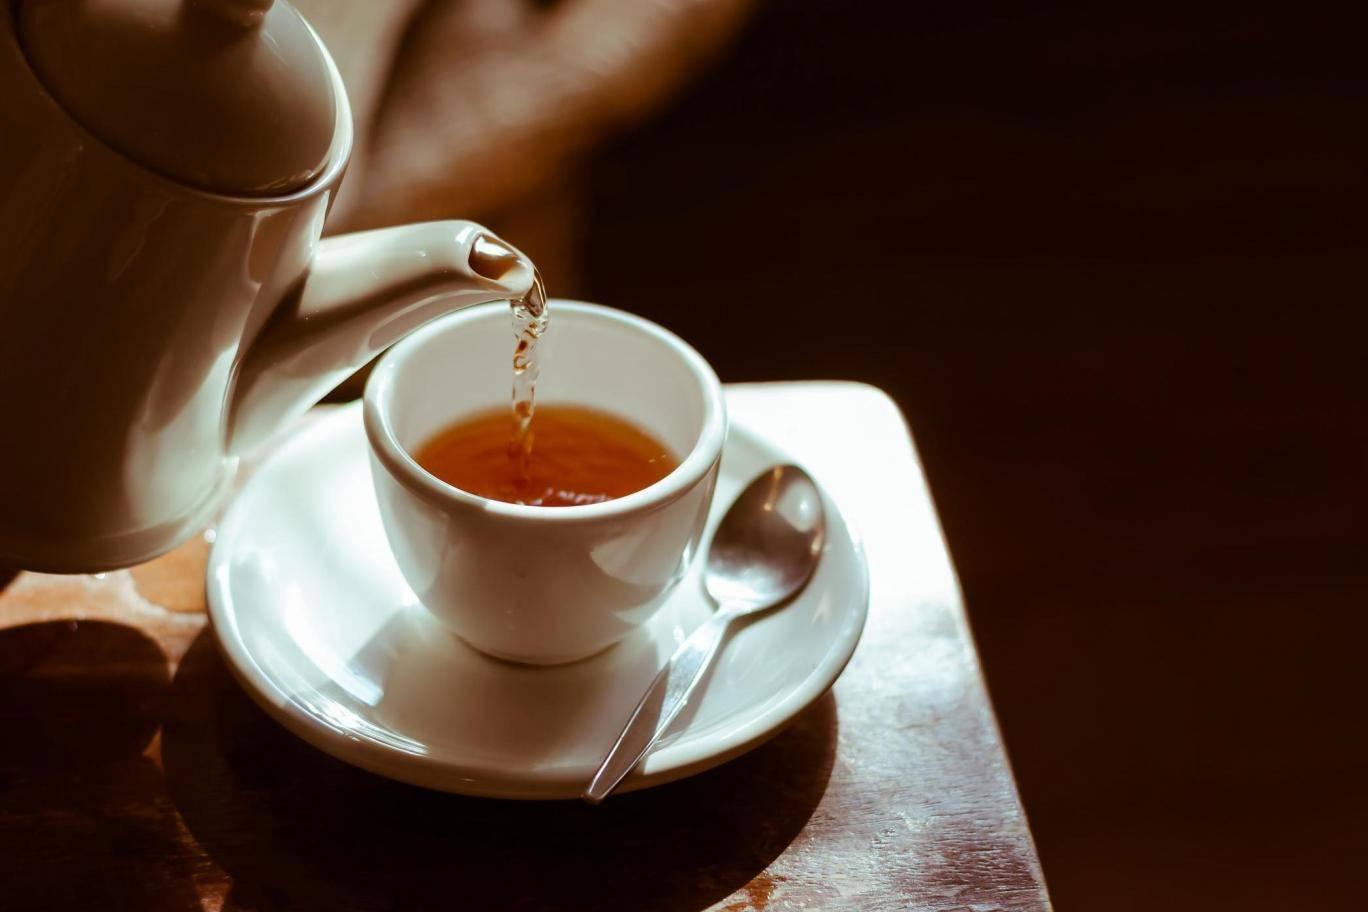 Drinking tea increases creativity, says study